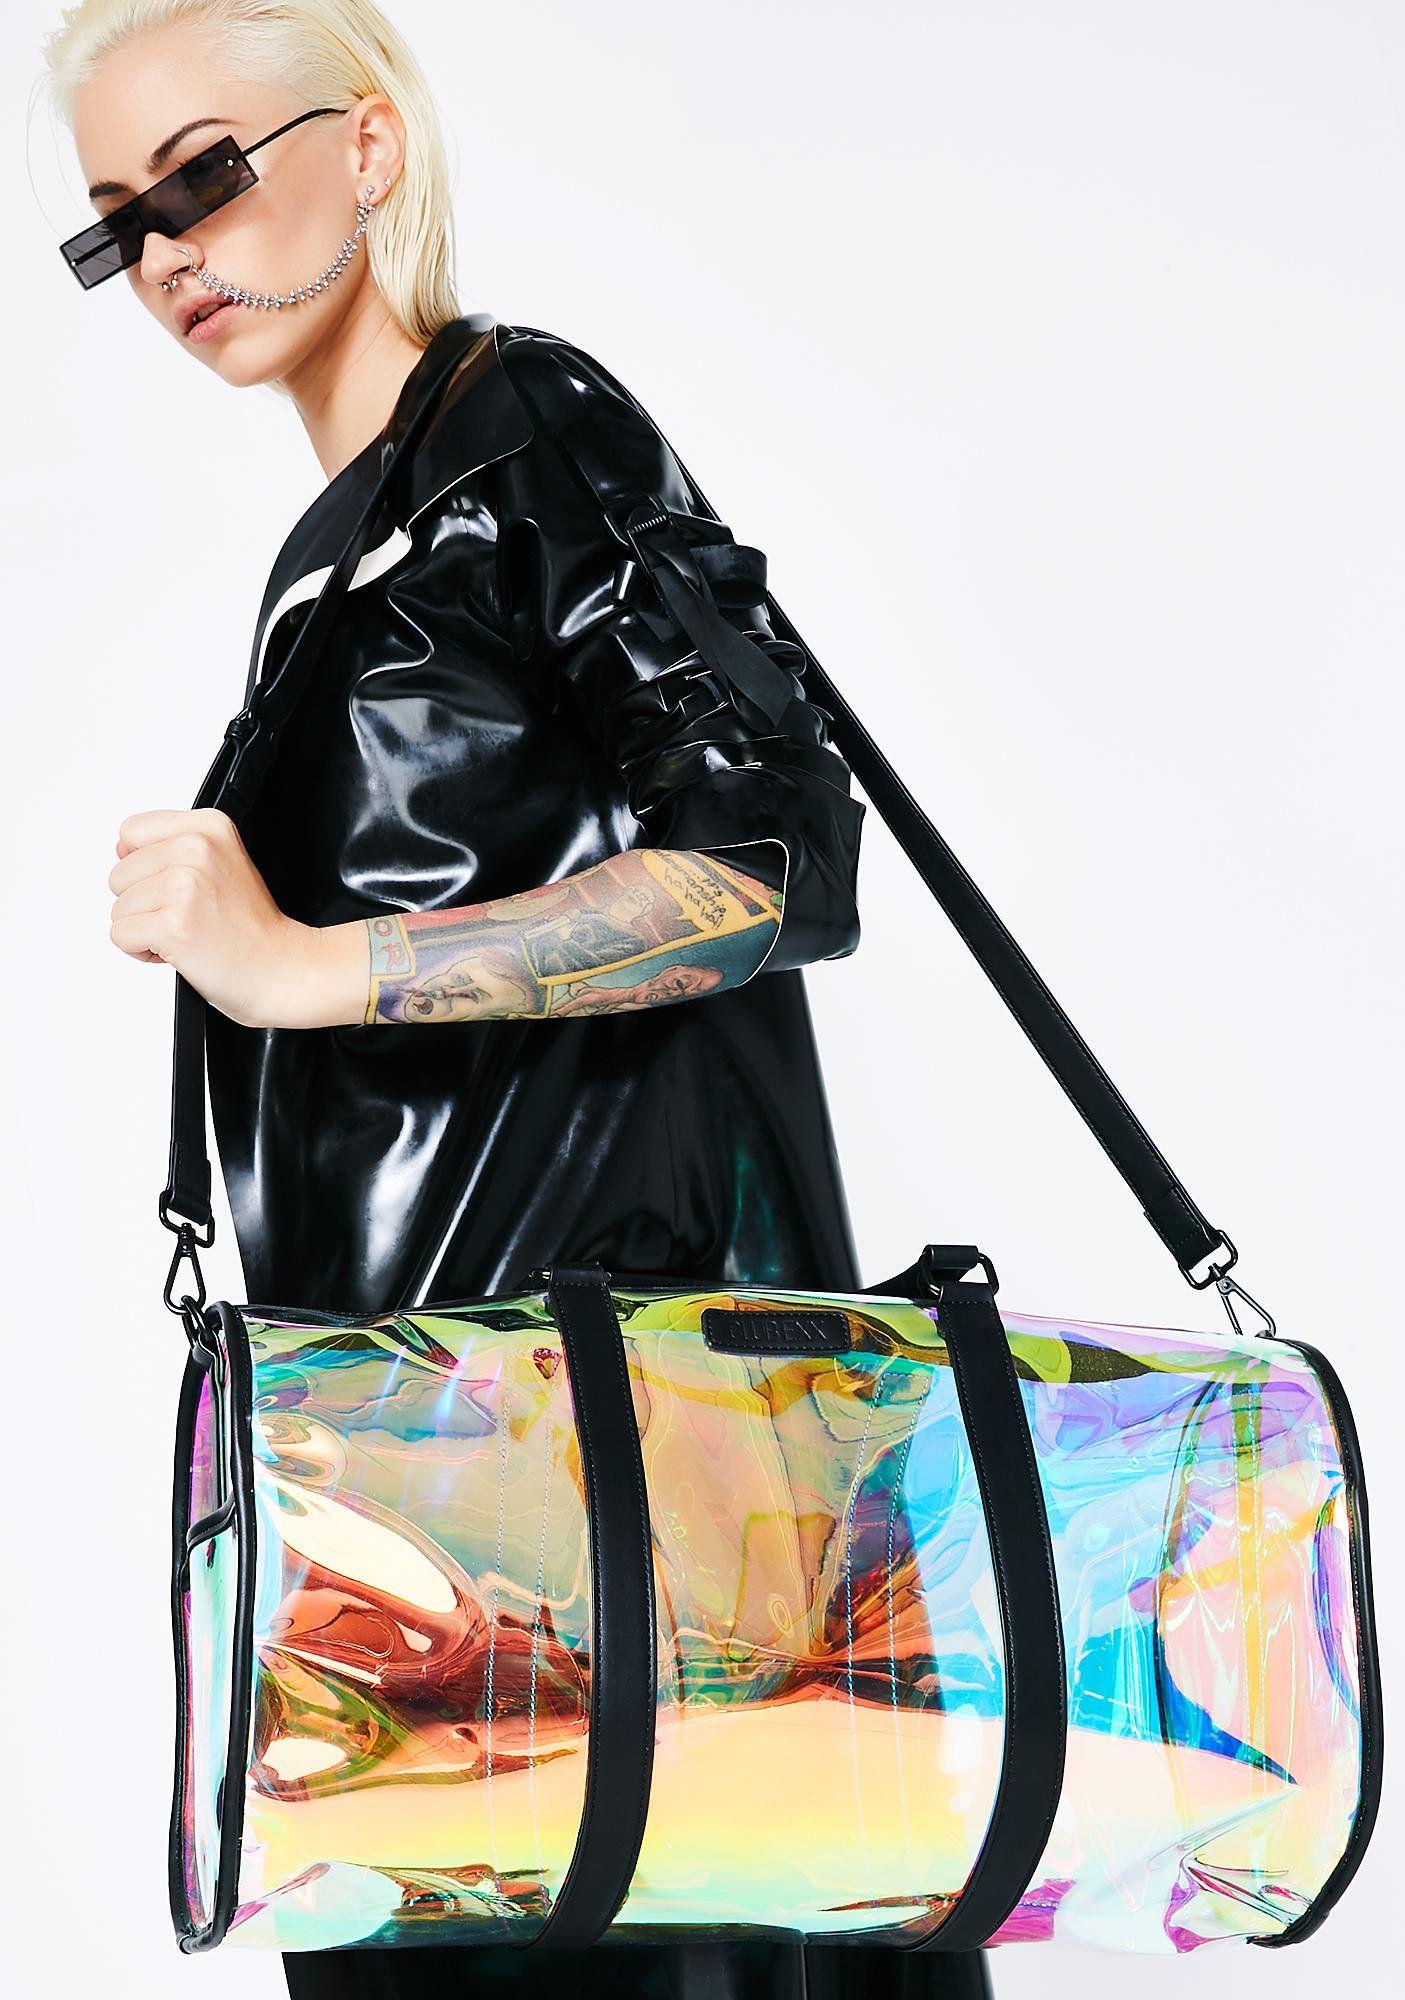 c7ea46f682 Club Exx Weirdo Weekender got ya spacin  out! This sikk af duffle bag has a  clear holographic body